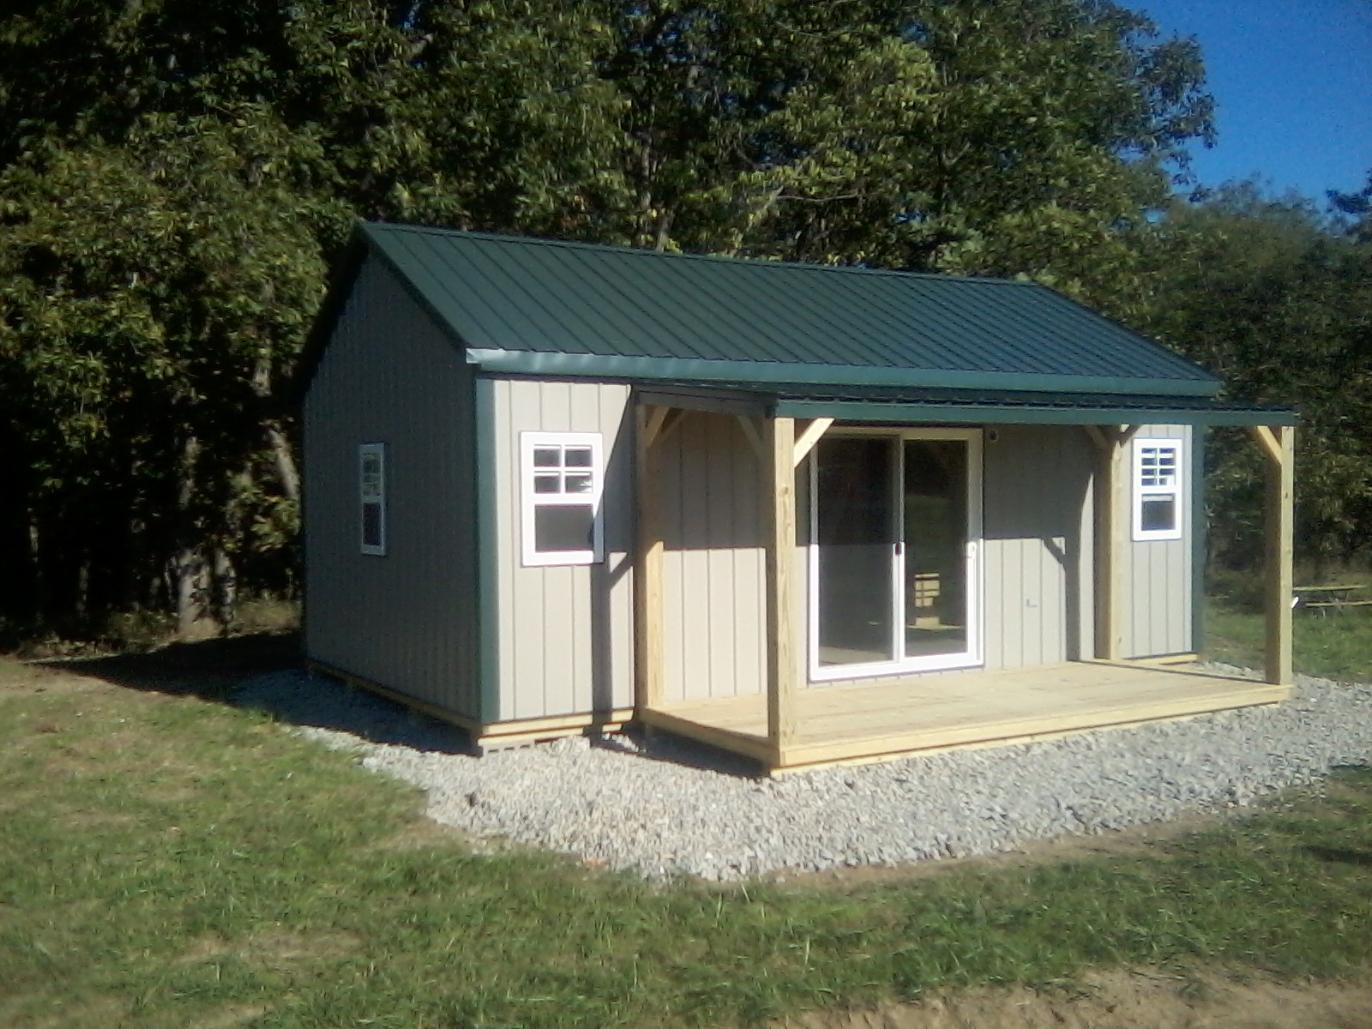 16x28 ozark deluxe cabin sunrise buildings for 8 x 16 cabin plans